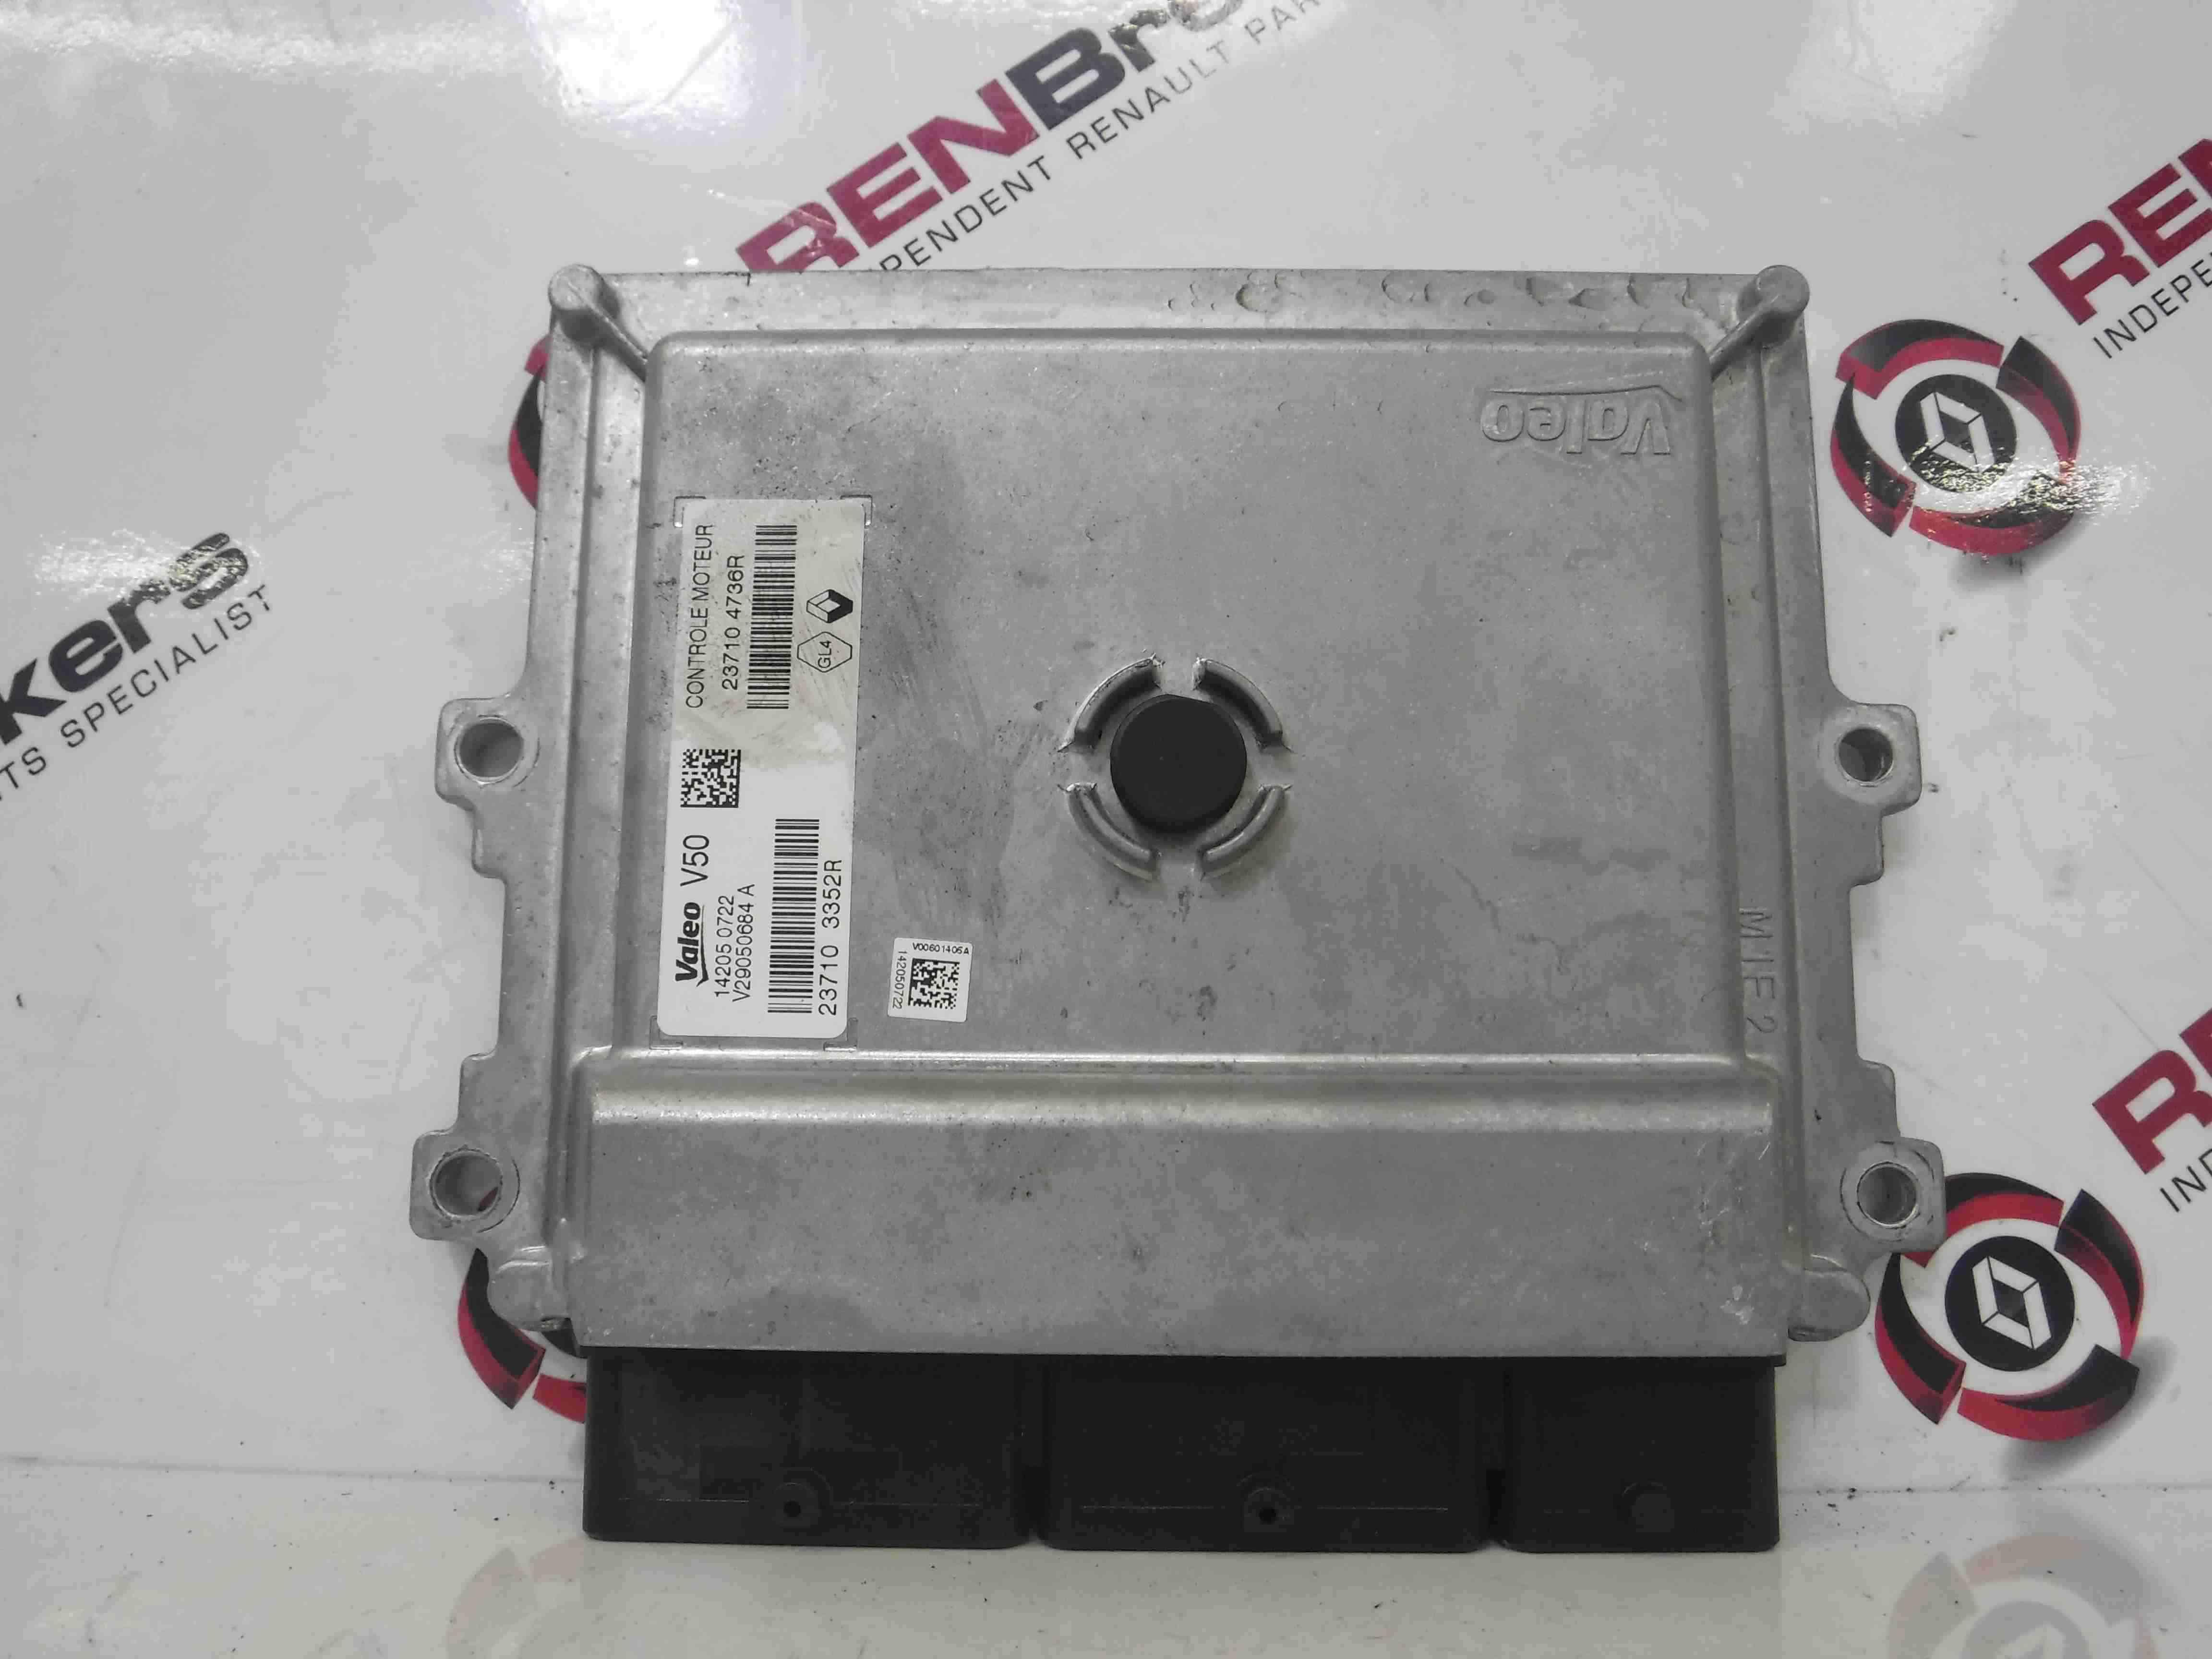 Renault Clio MK4 2013-2015 1.2 16v Engine Control Unit ECU 237103352R 237104736R